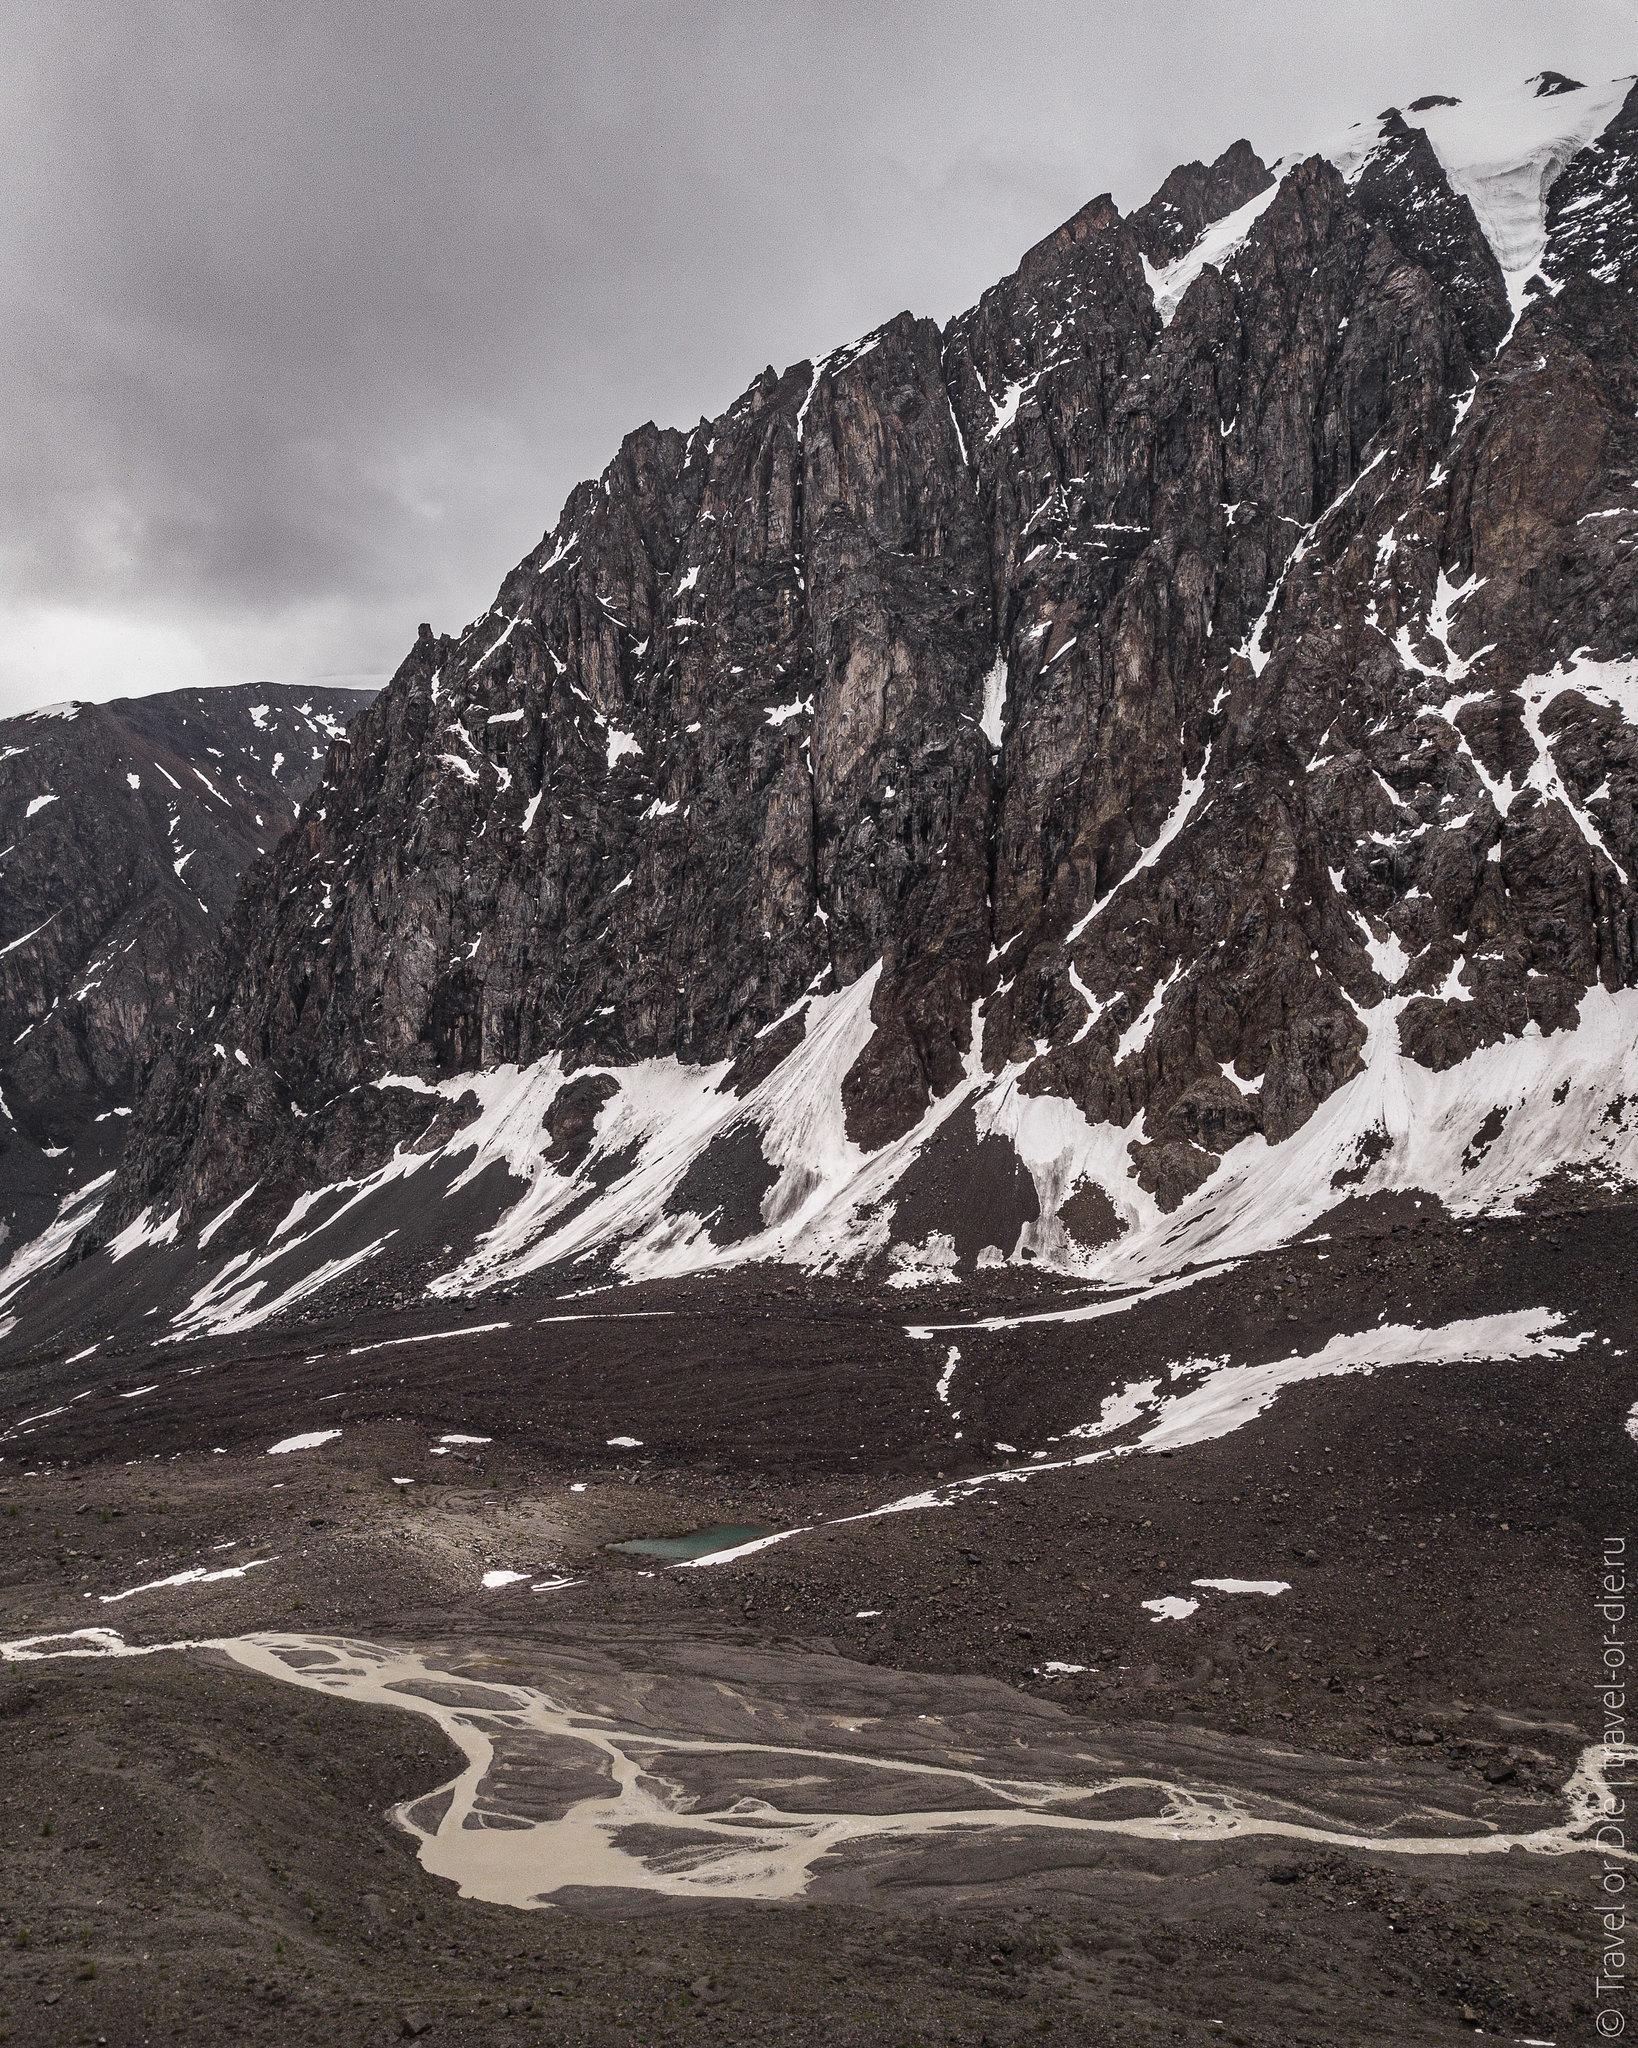 Aktru-Glacier-Altay-Ледник-Актру-Алтай-dji-mavic-0508